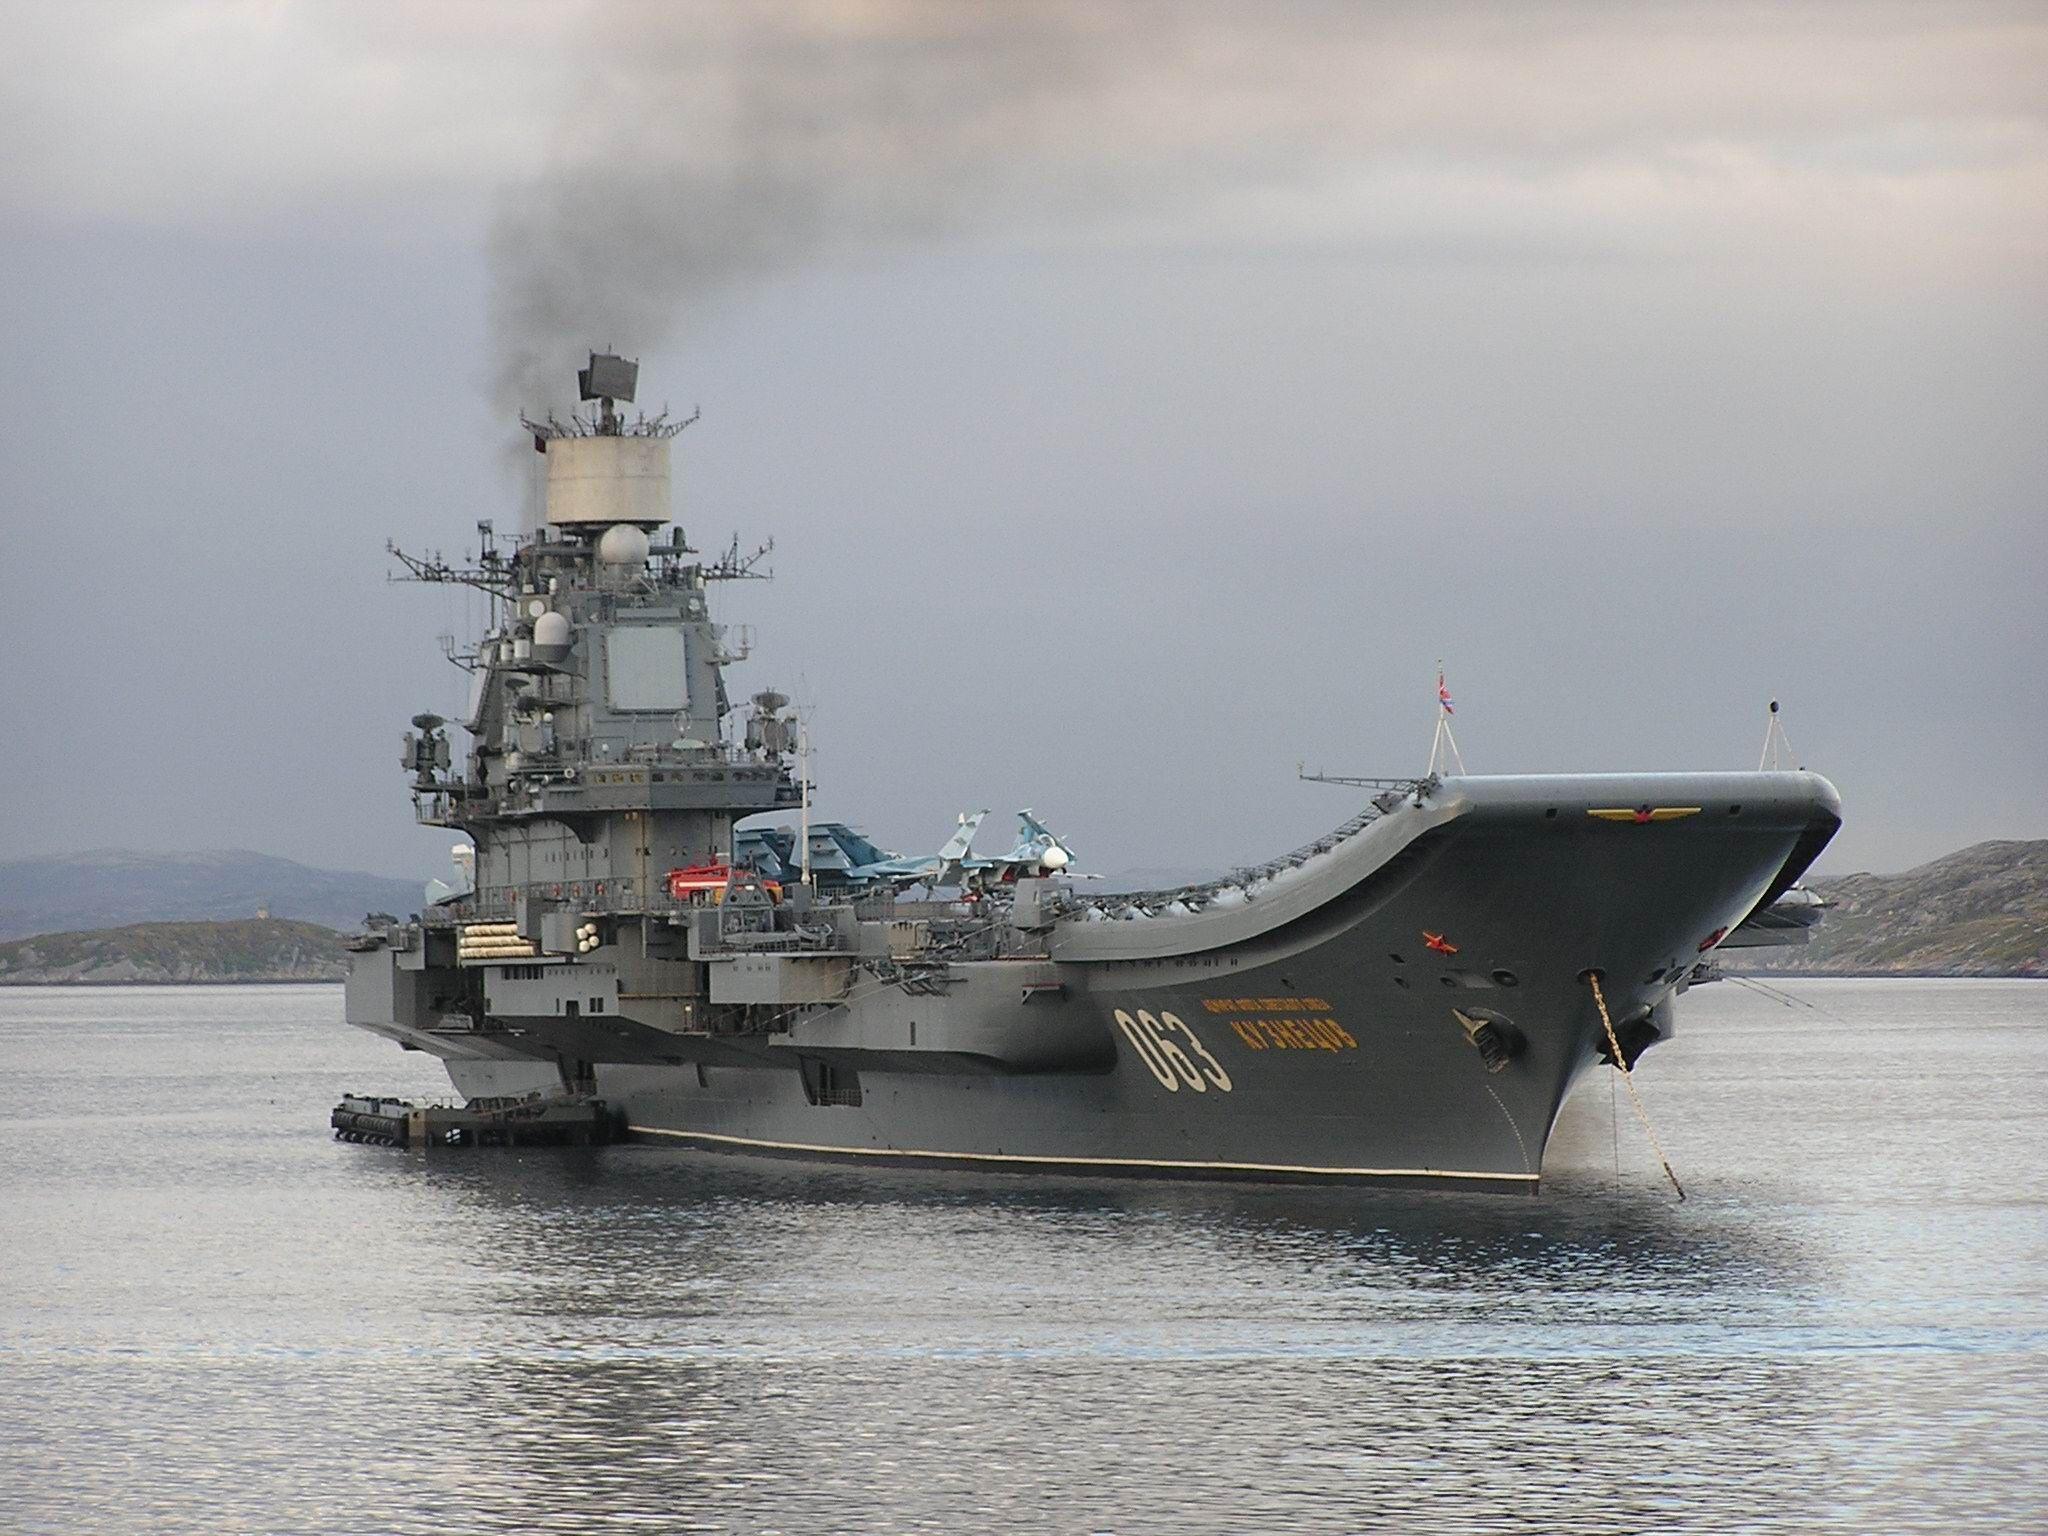 На Адмирале Кузнецове произошел пожар -